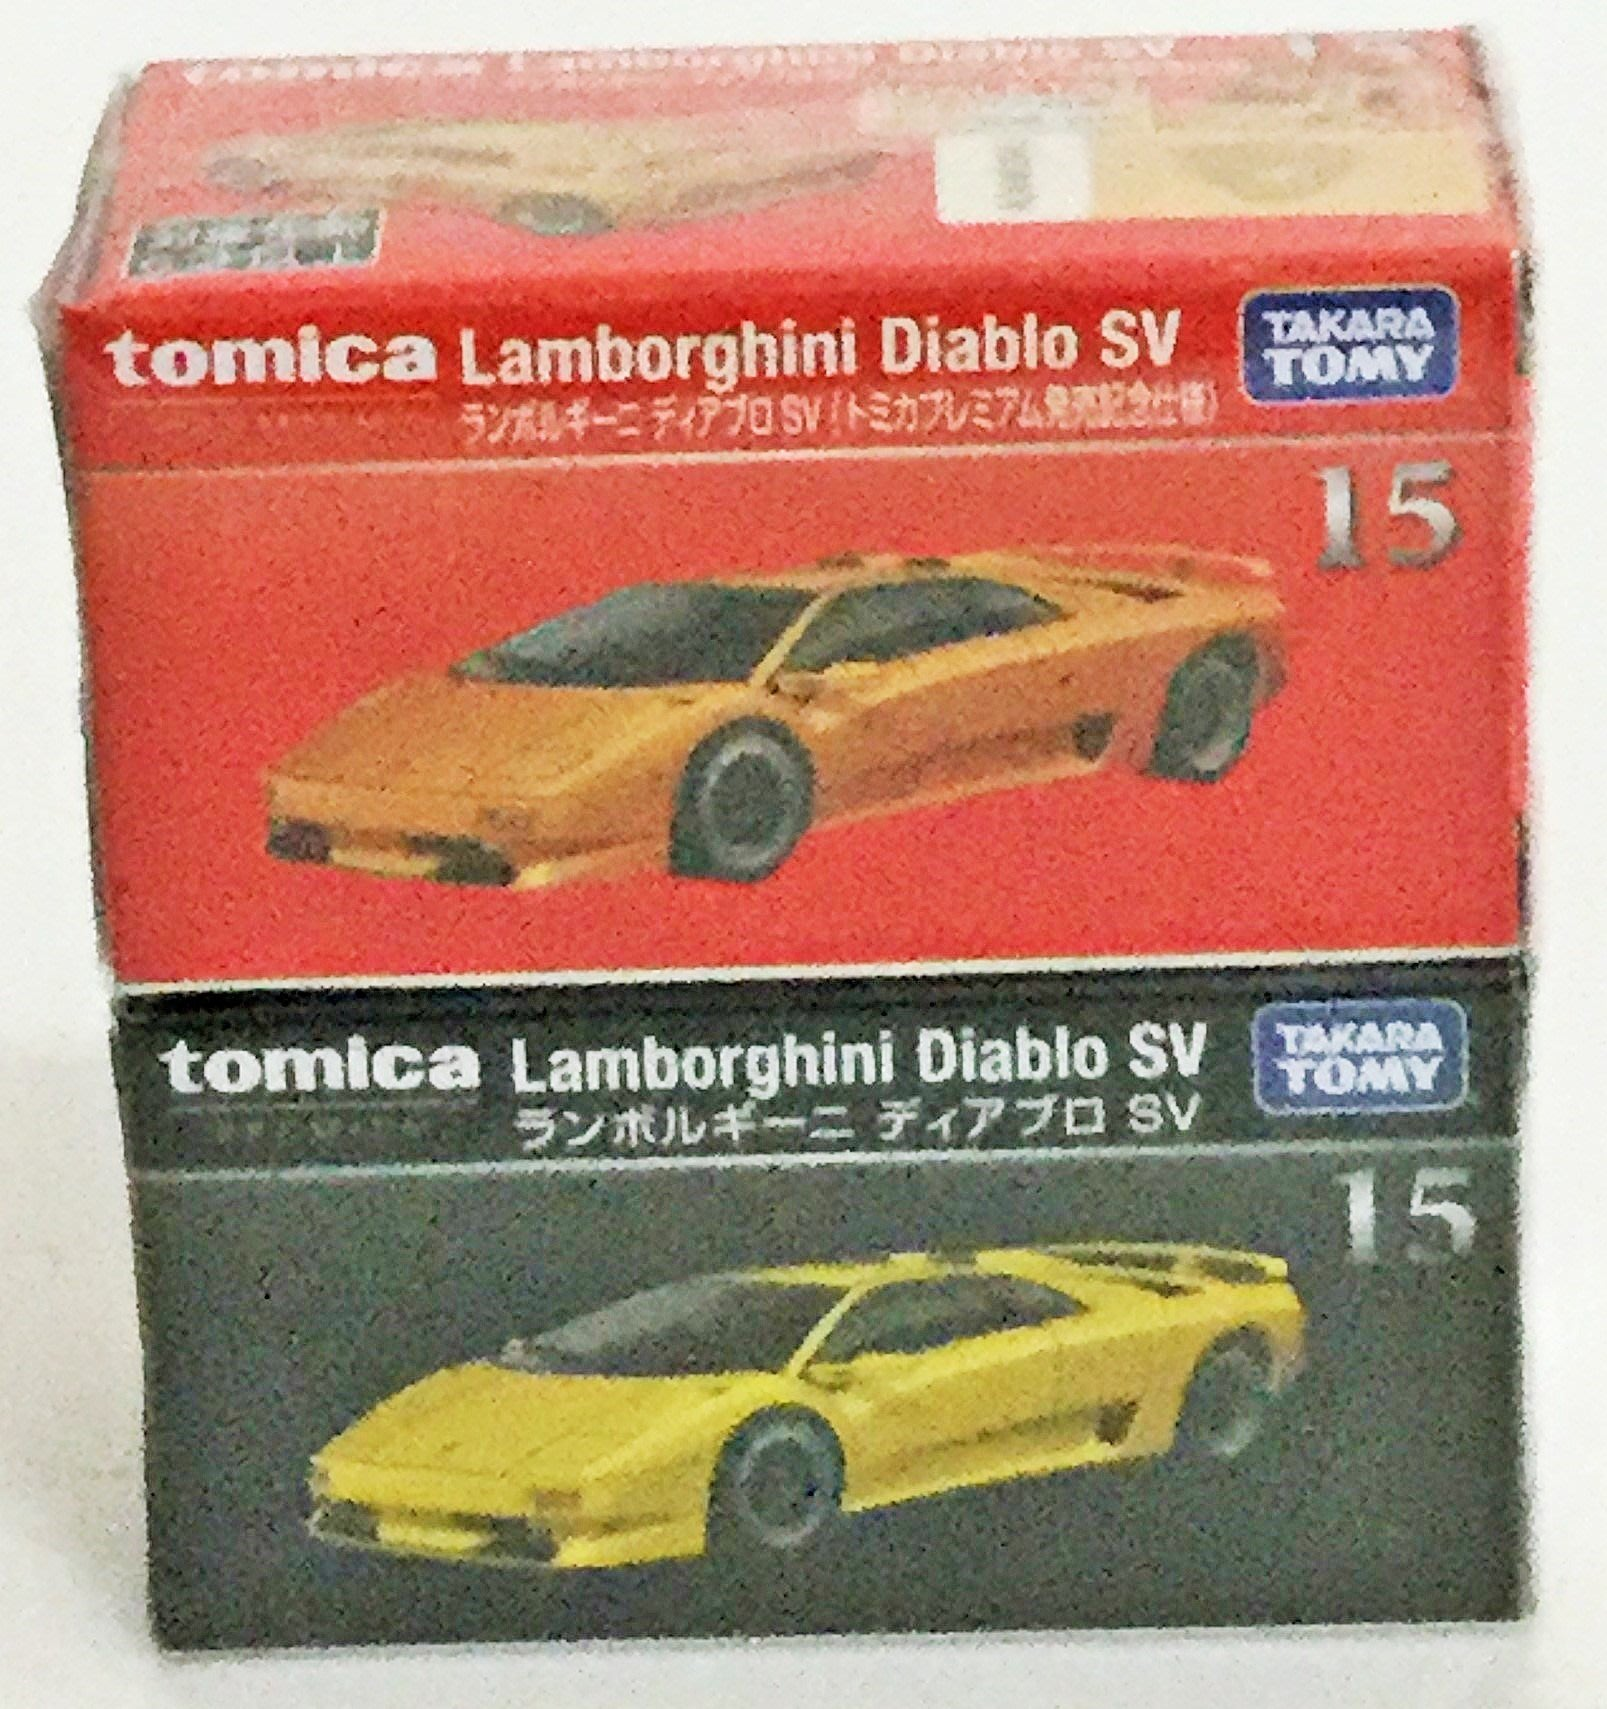 Tomica 15 的拍賣價格 飛比價格